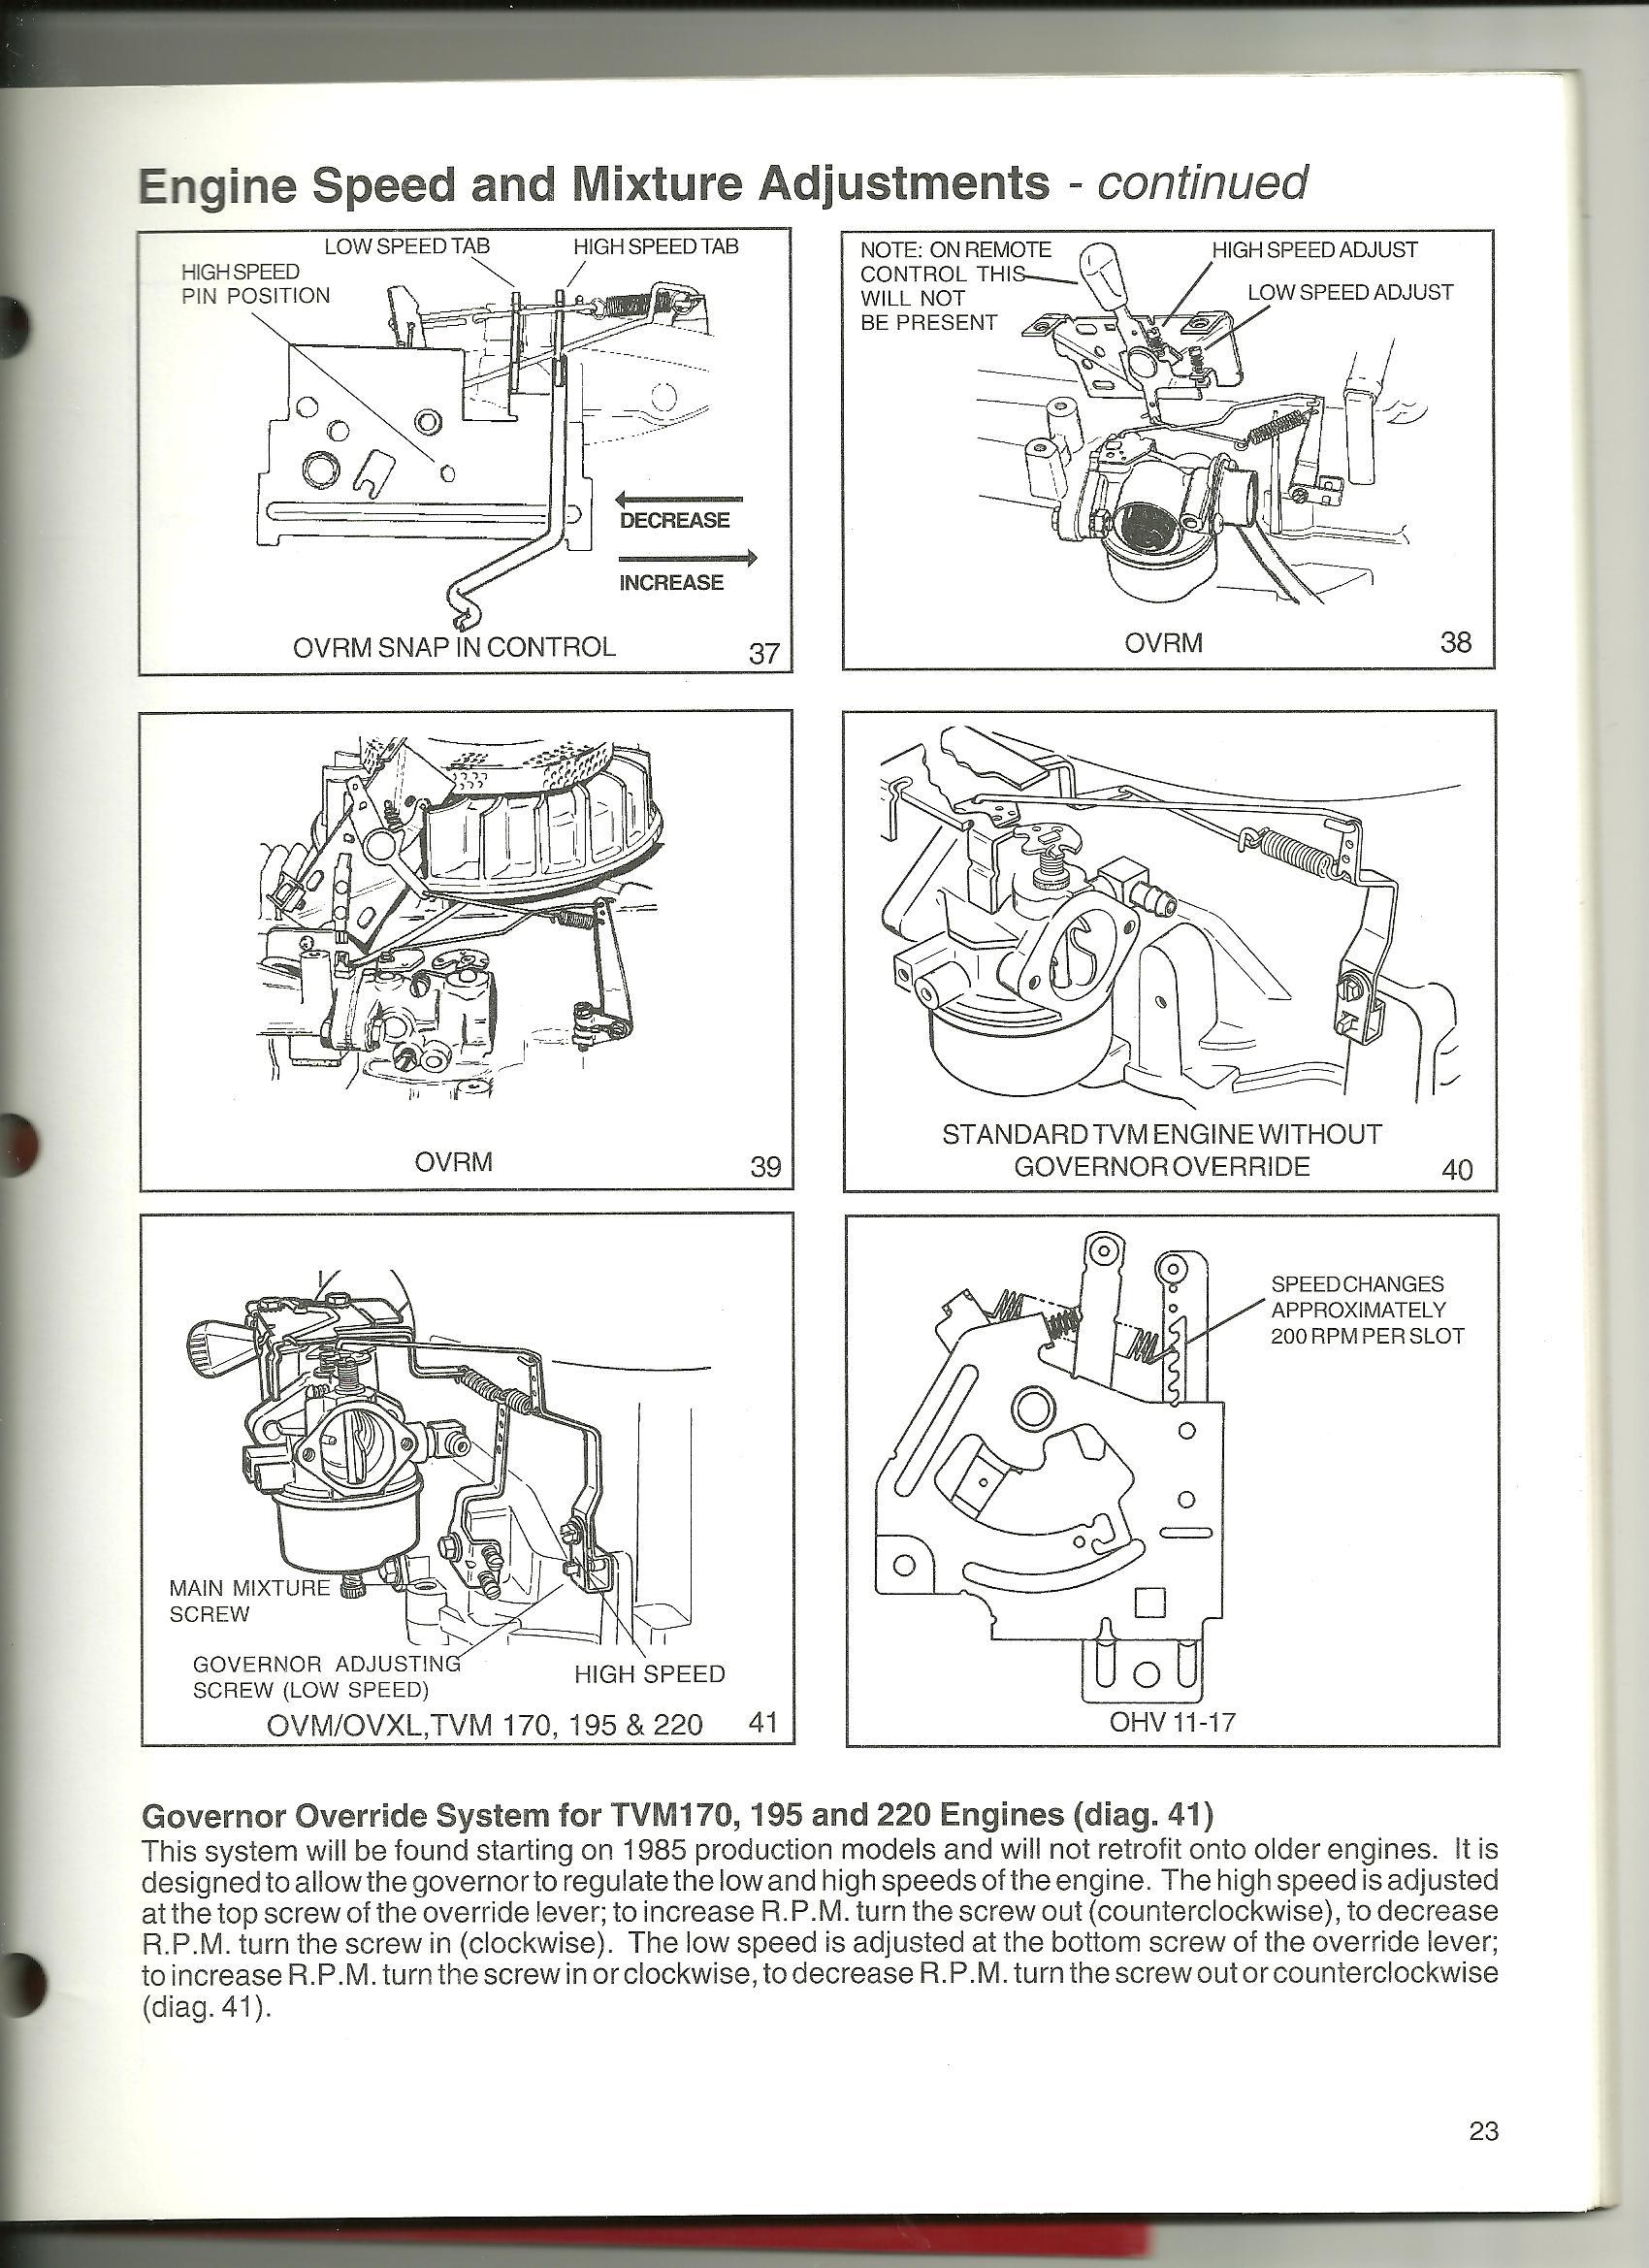 Craftsman Lt2000 Riding Lawn Mower Carburetor Linkage Diagram Best Tecumseh Engines Photos 4 Cycle Small Engine Carburetors Free Image For Briggs And Stratton 1705 Hp